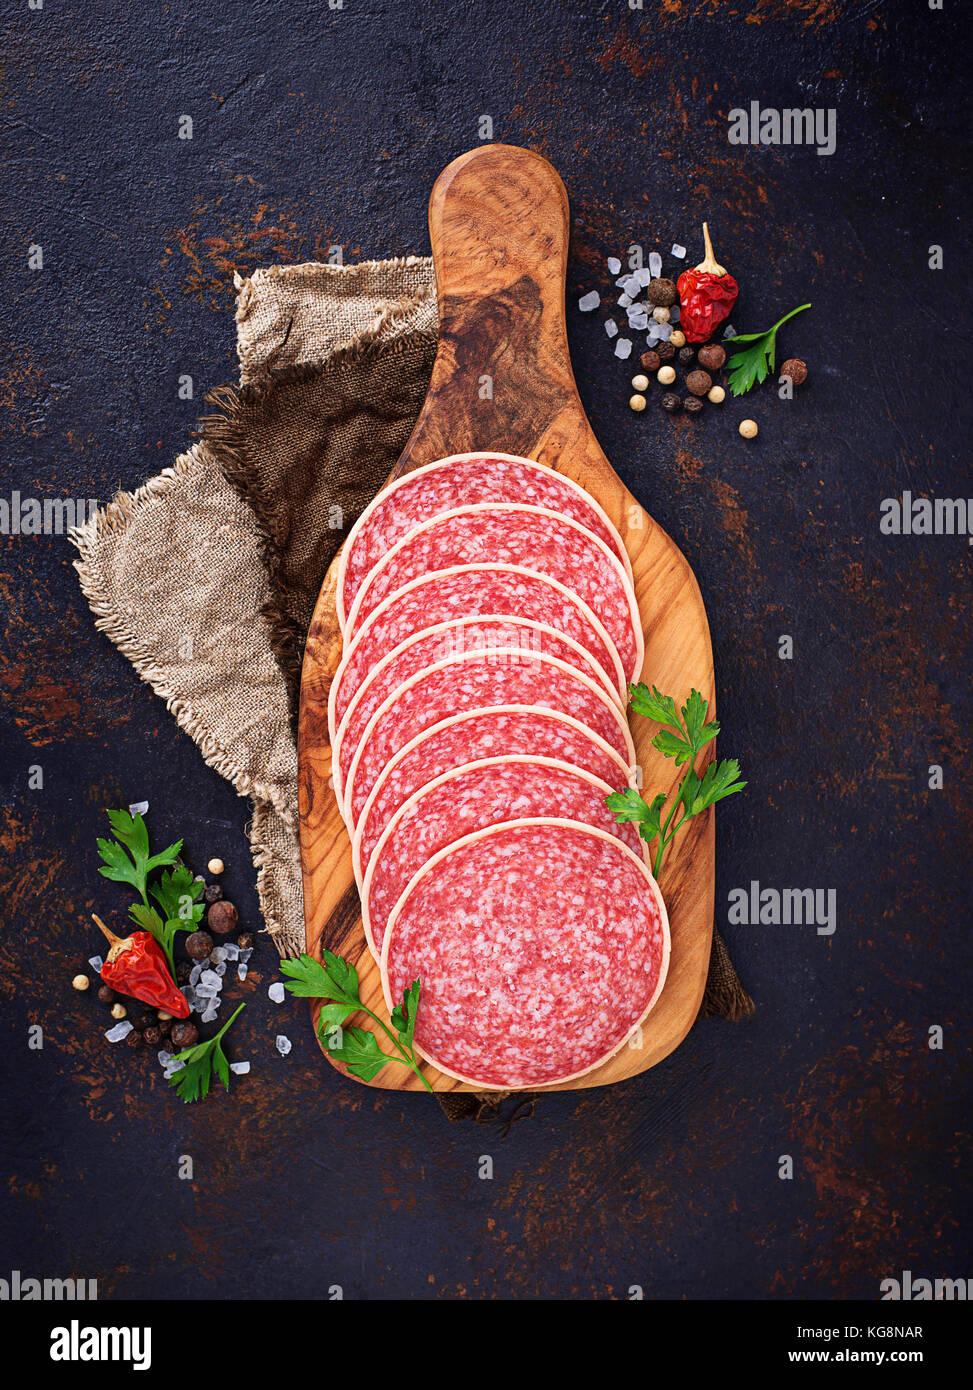 Italian salami sausage on wooden board. - Stock Image